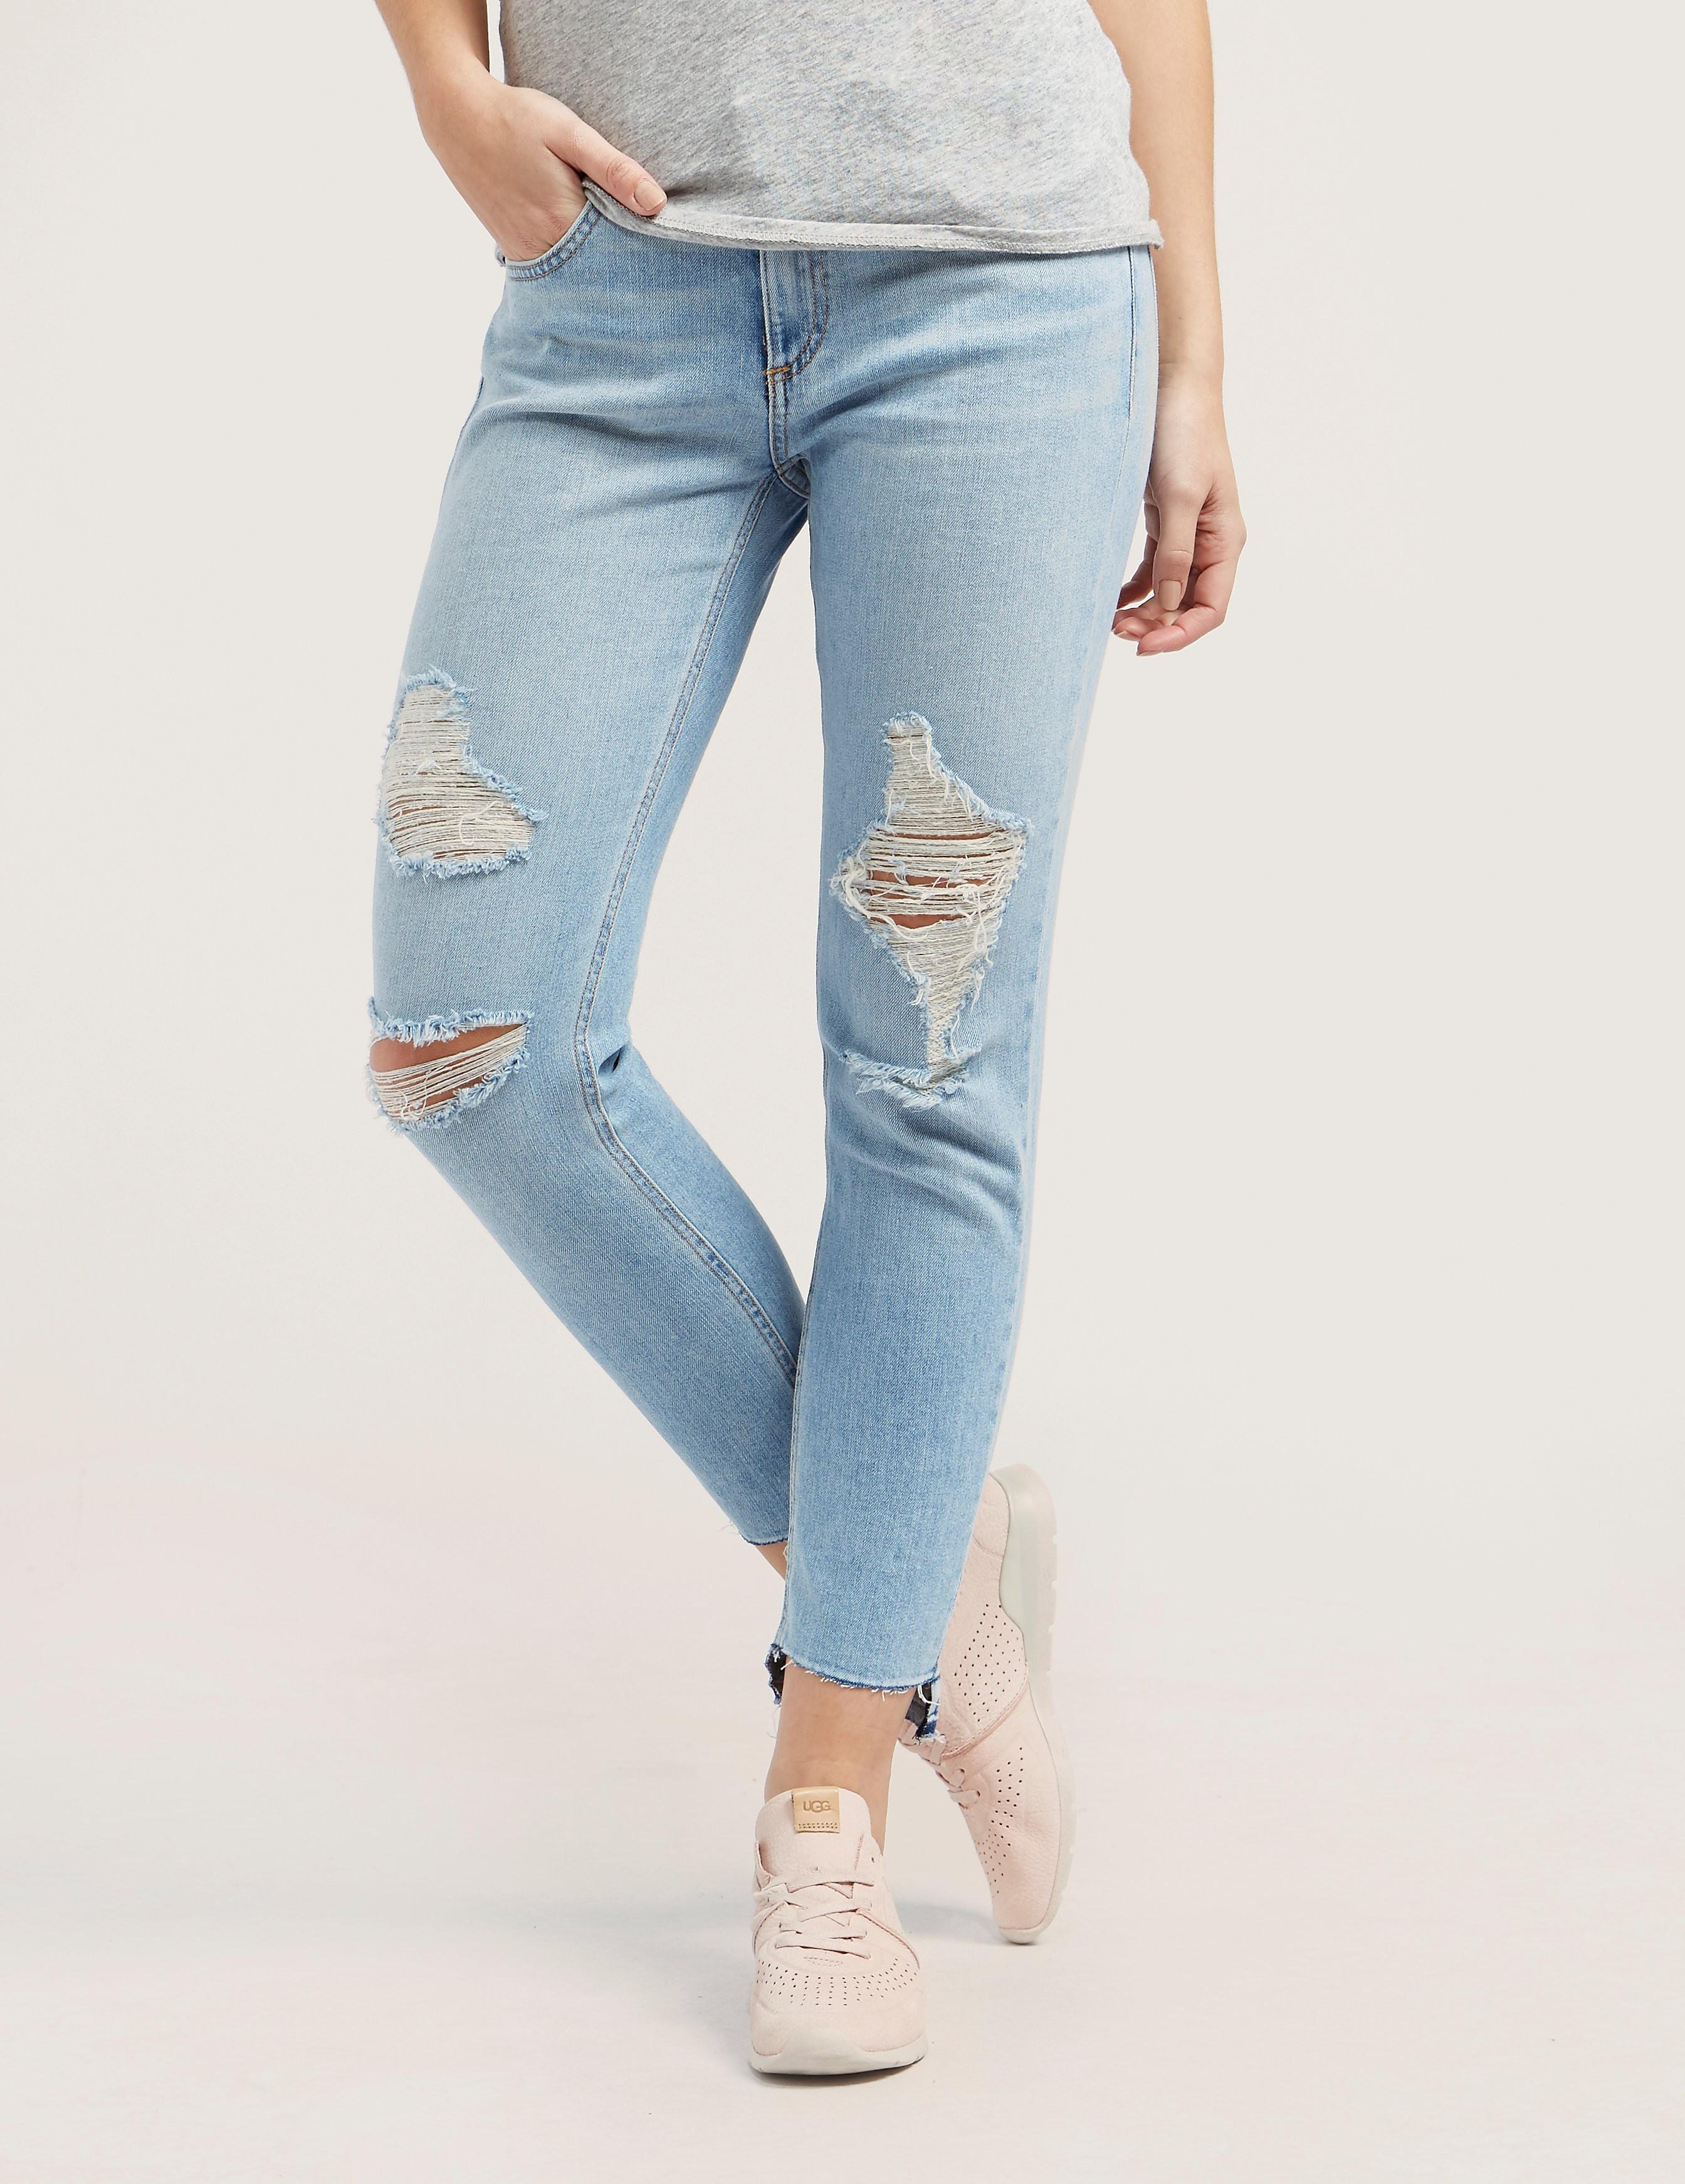 Rag & Bone Dre Caprl Jeans